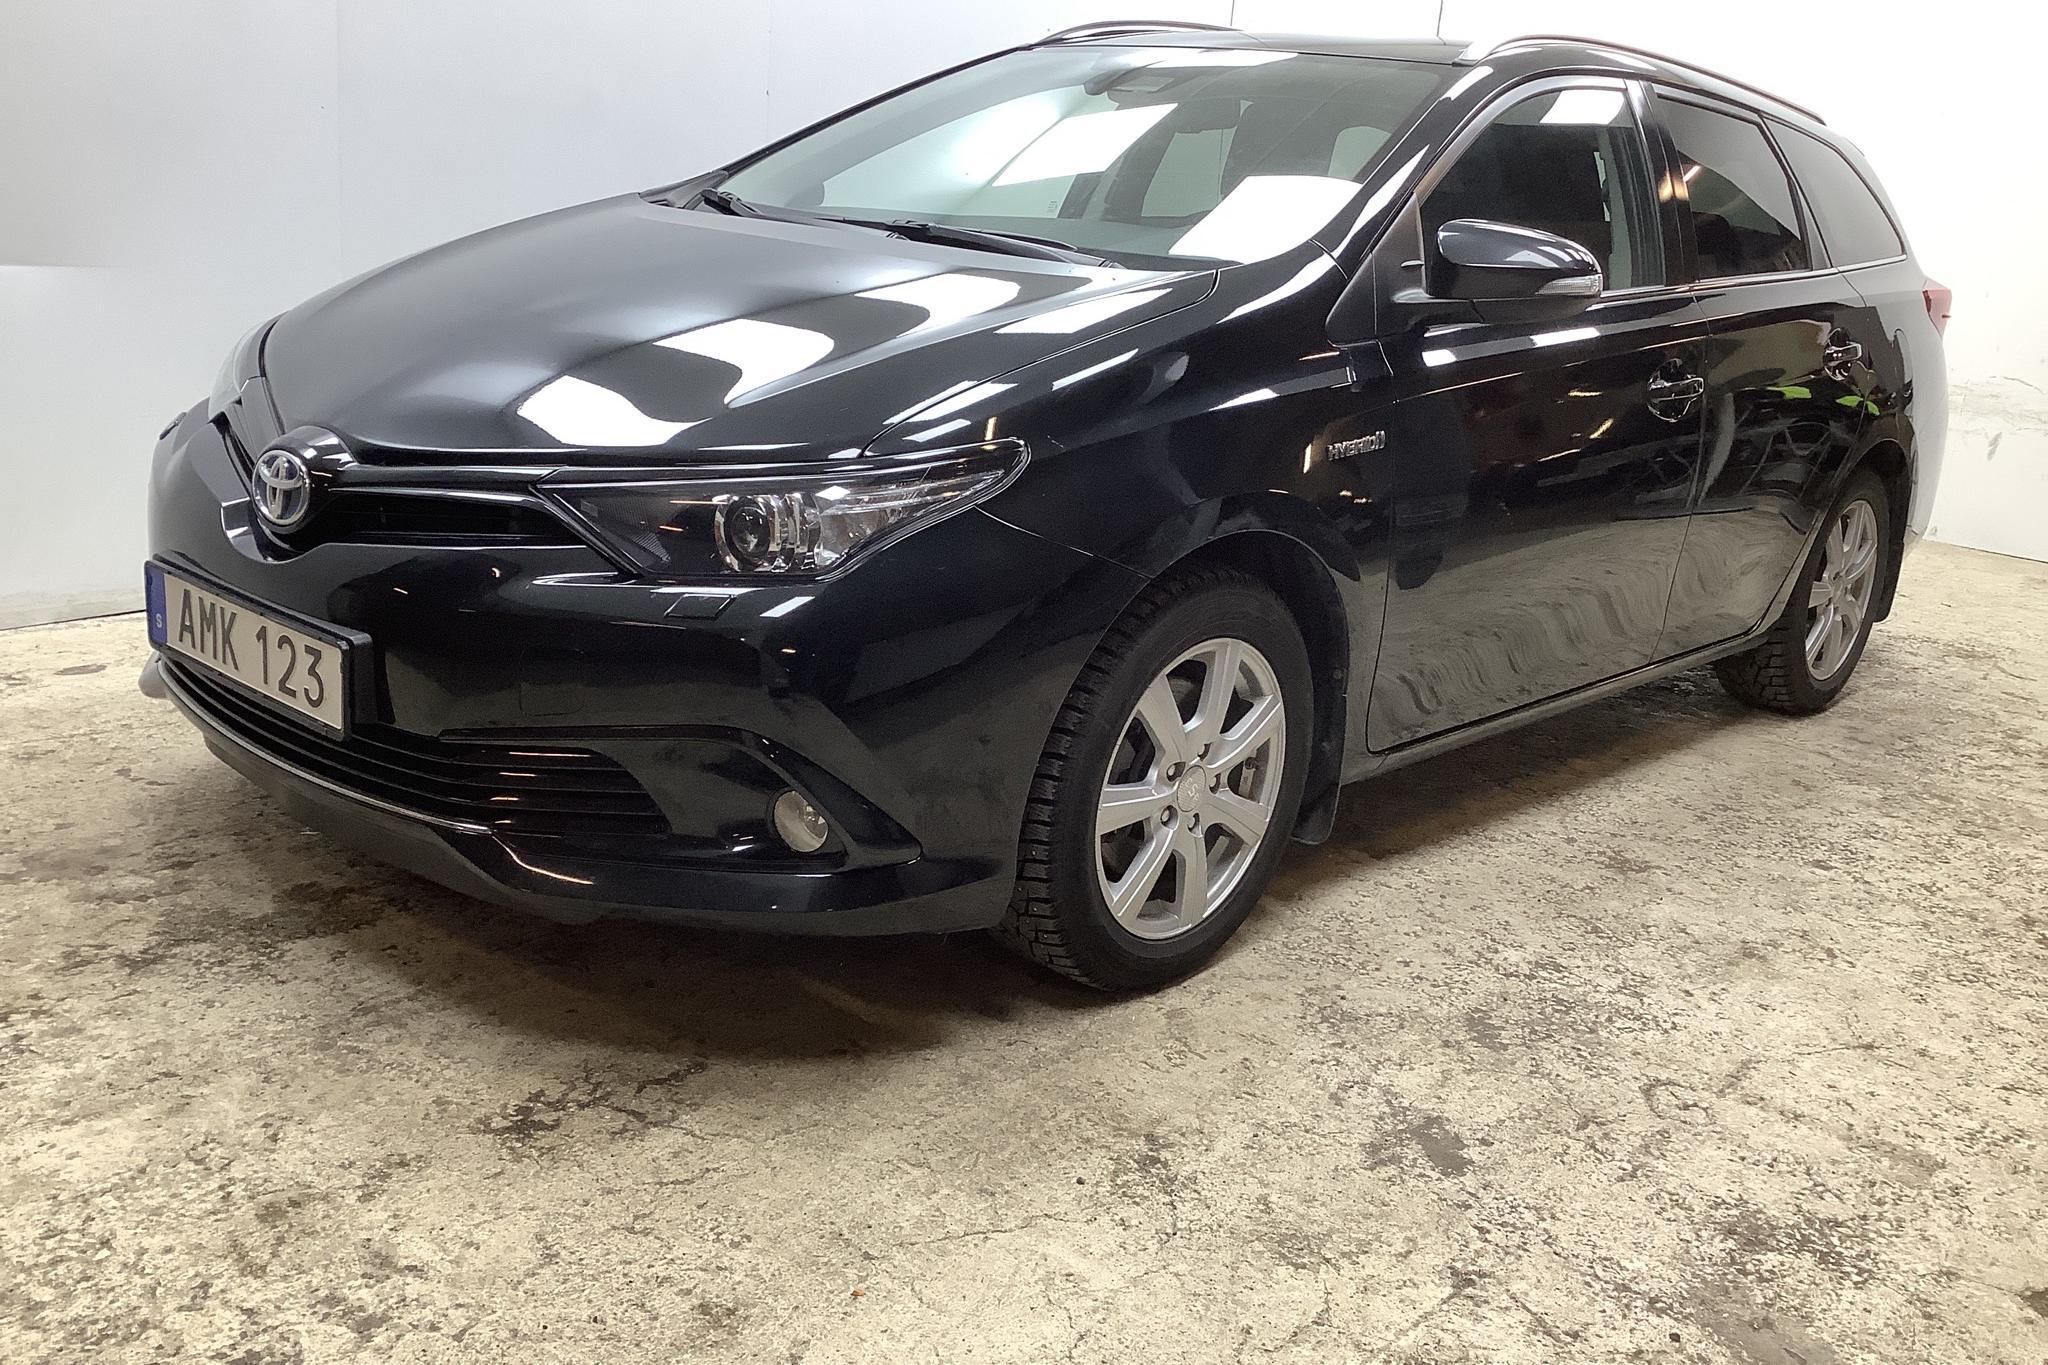 Toyota Auris 1.8 HSD Touring Sports (99hk) - 6 103 mil - Automat - svart - 2018